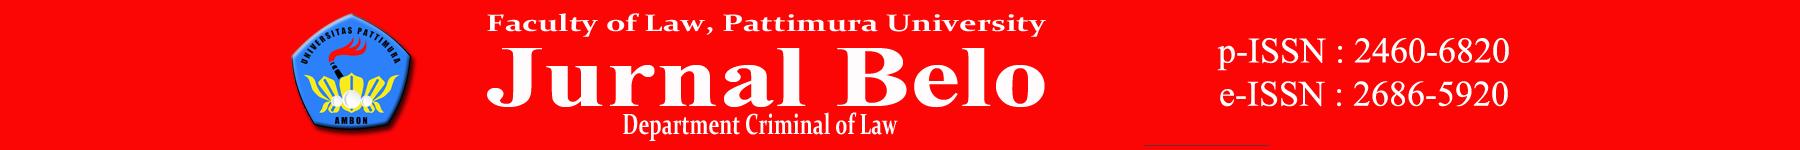 Jurnal Belo Header Image